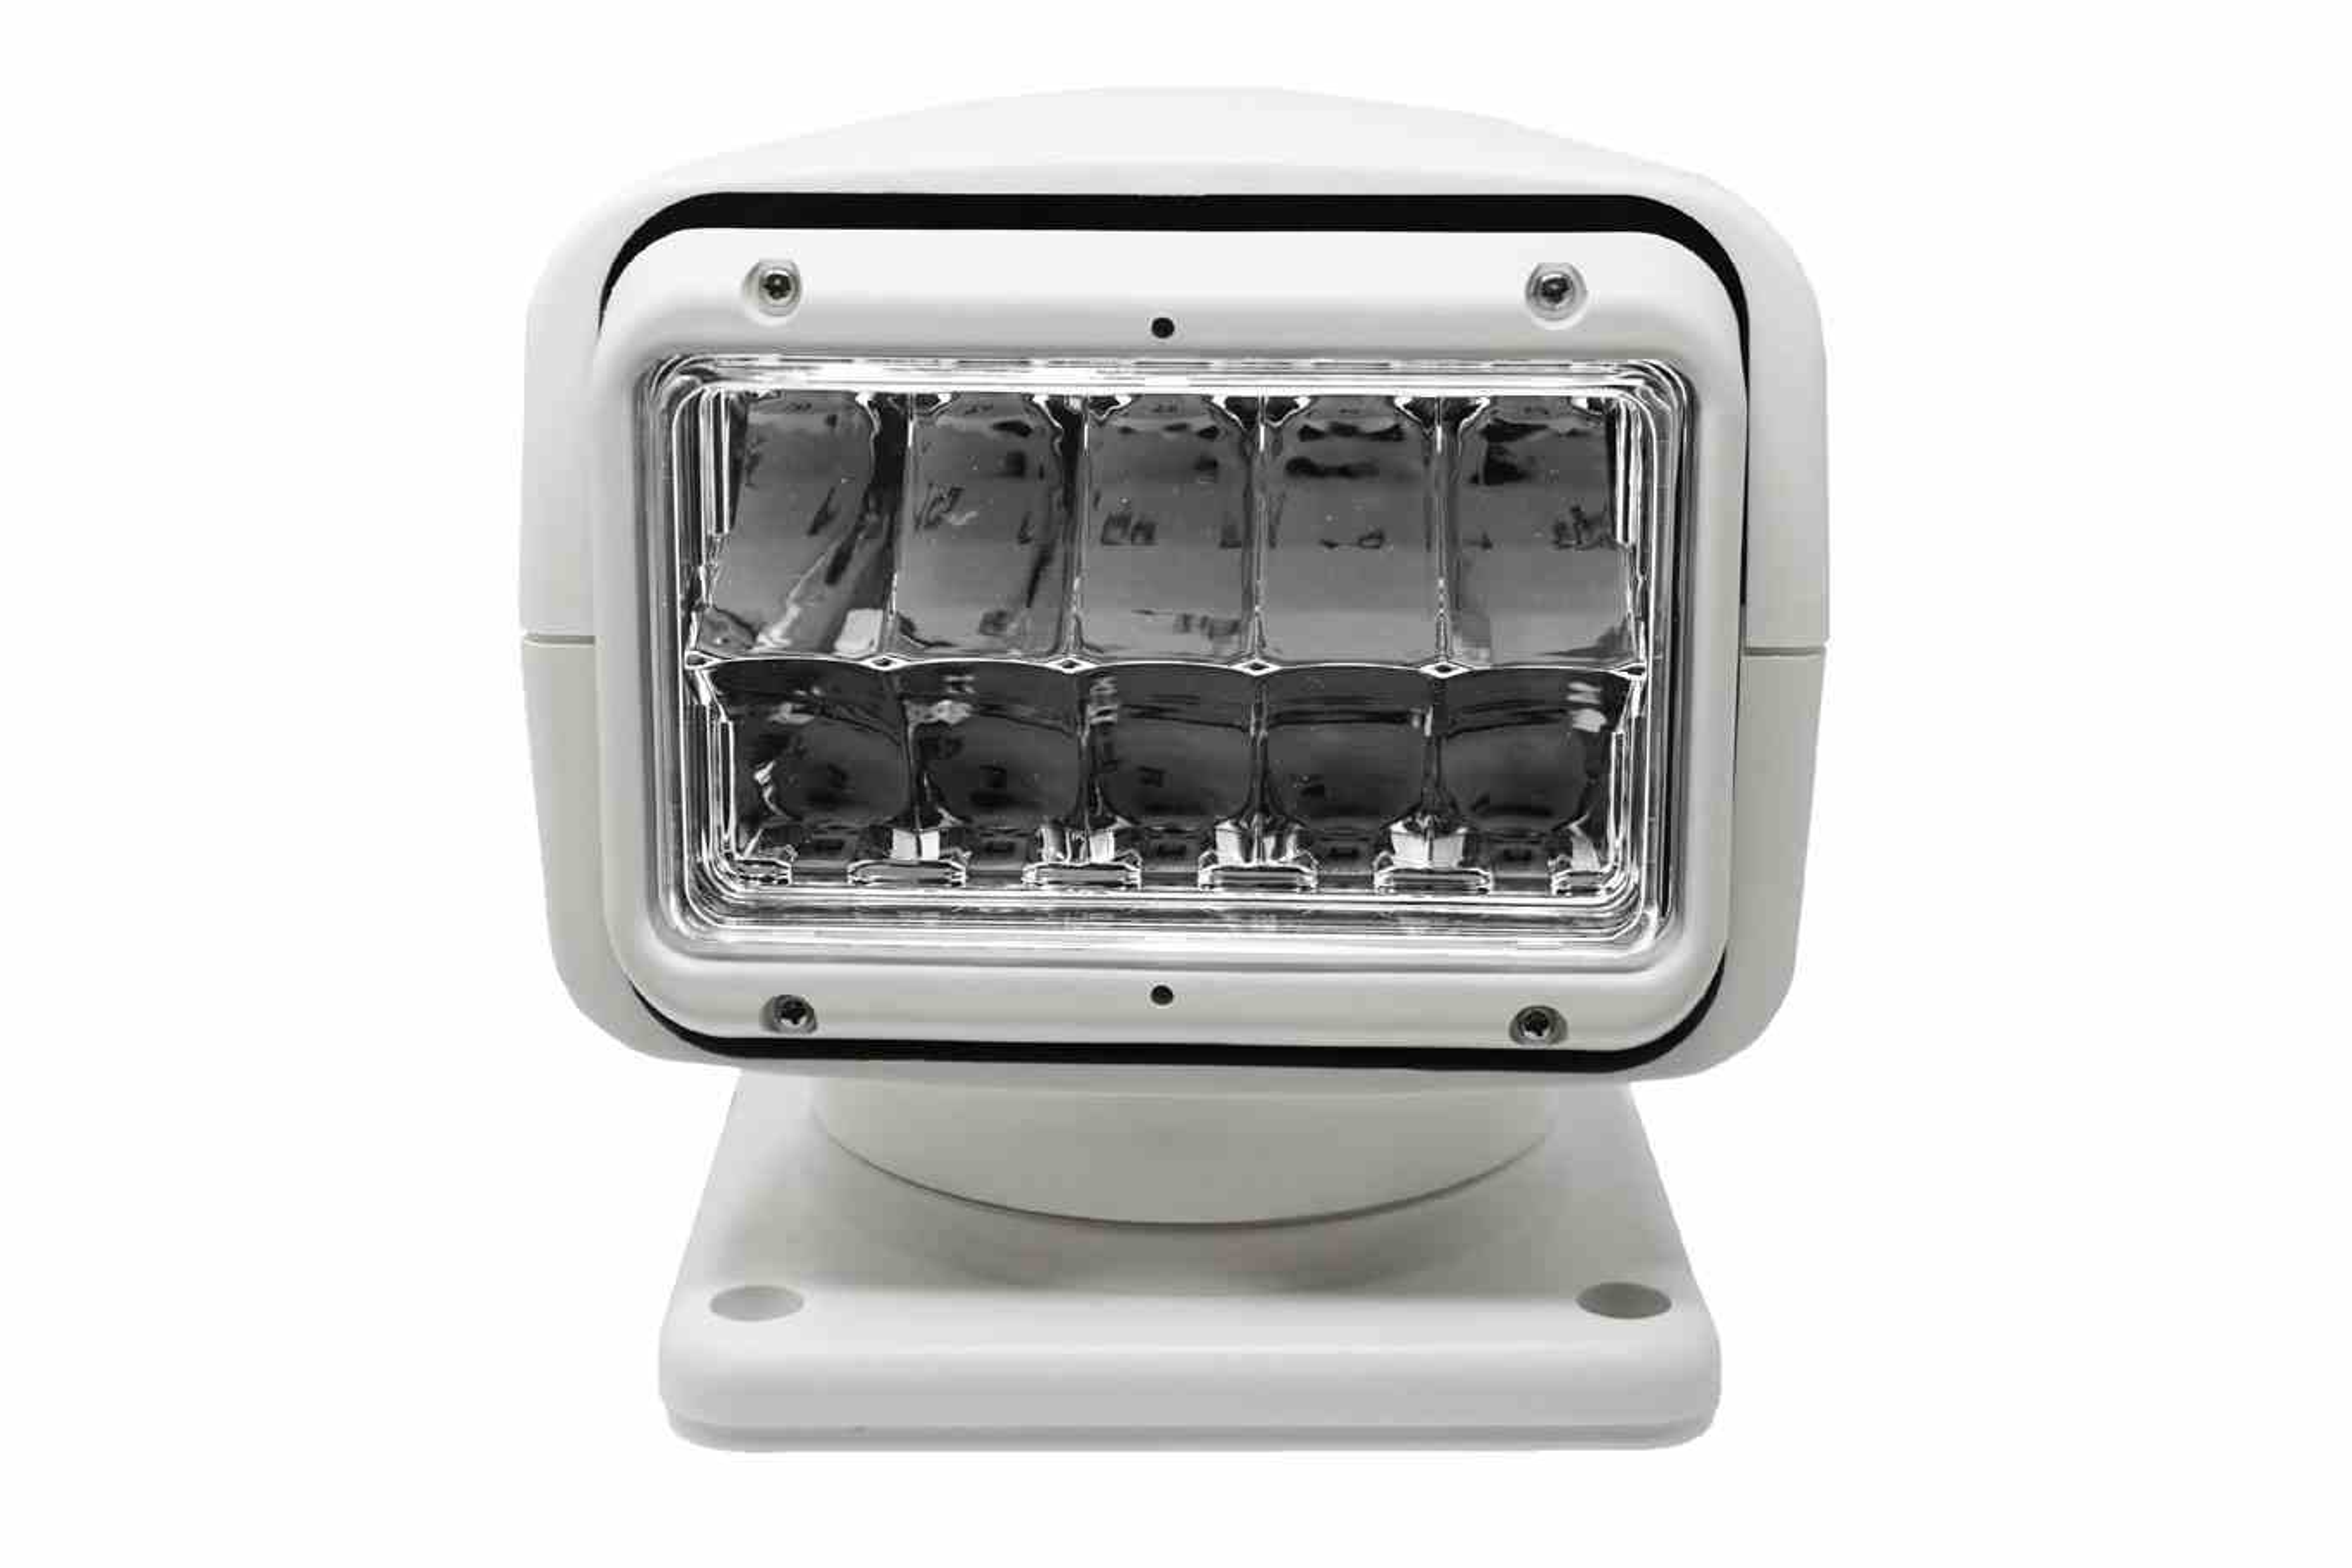 spot light switch diagram kenwood head unit wiring golight radioray gl 2020 remote control spotlight